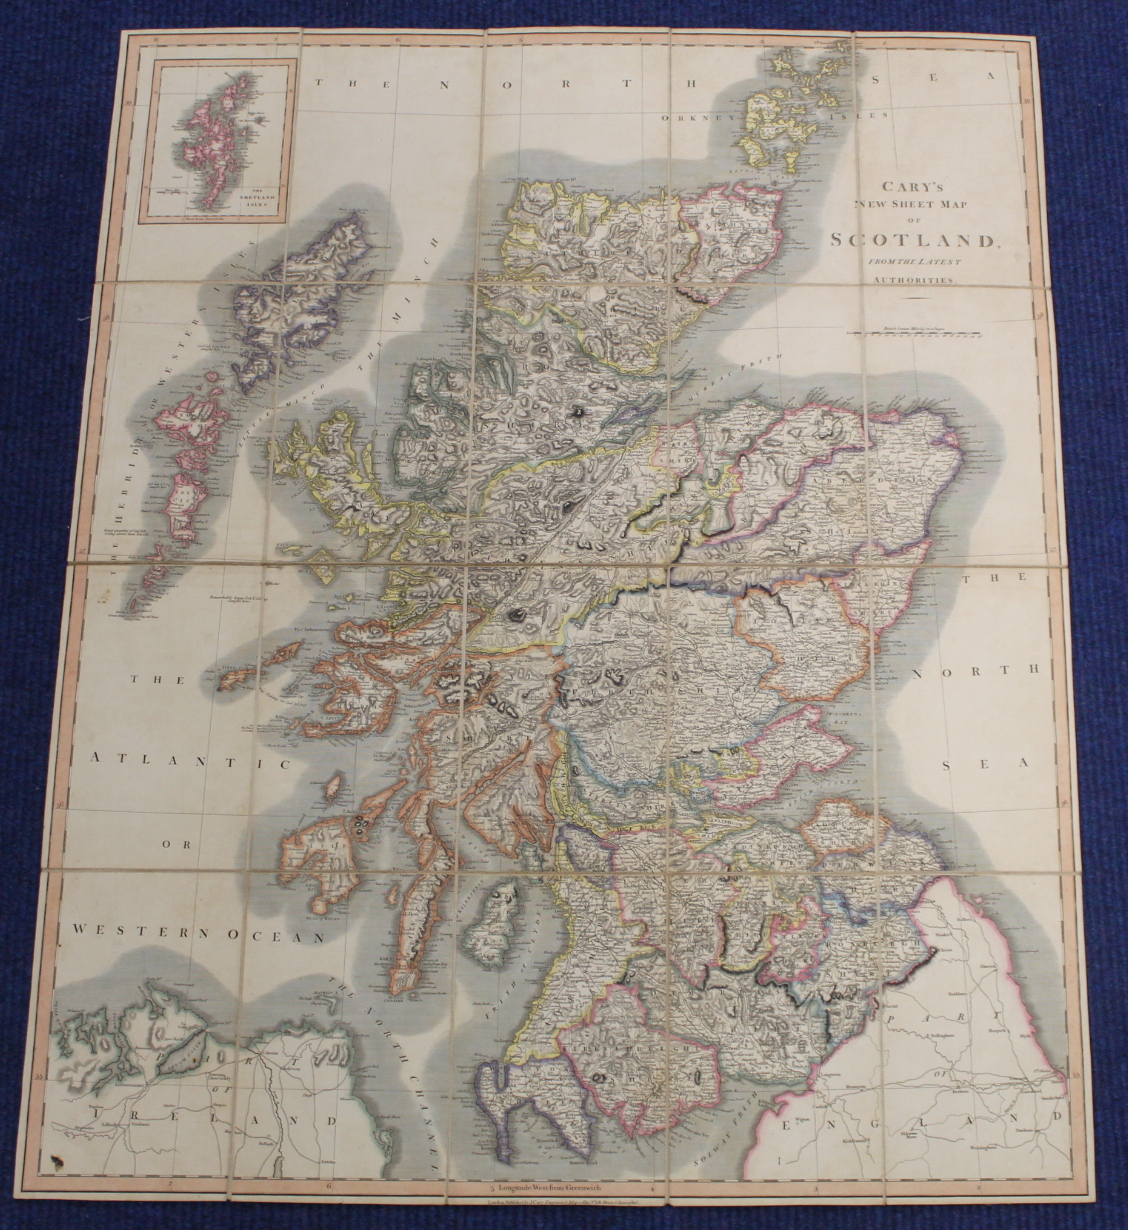 KIRKWOOD J. & SONS.Map of Scotland. Hand col. eng. fldg. linen map in well worn orig. slip case. - Image 33 of 36